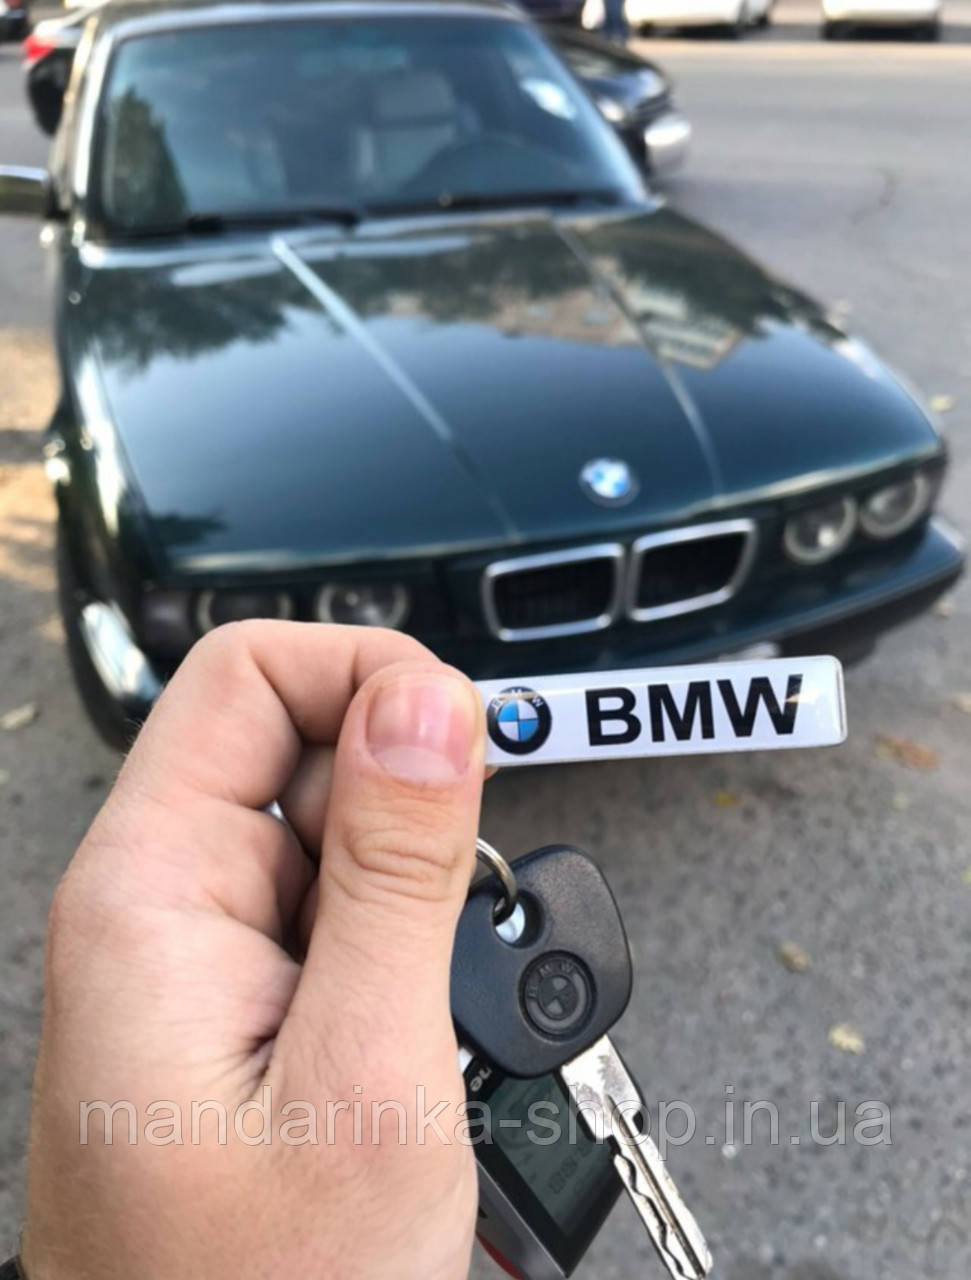 Брелок с номером (стандарт XL)  логотип BMW, брелок с фамилией